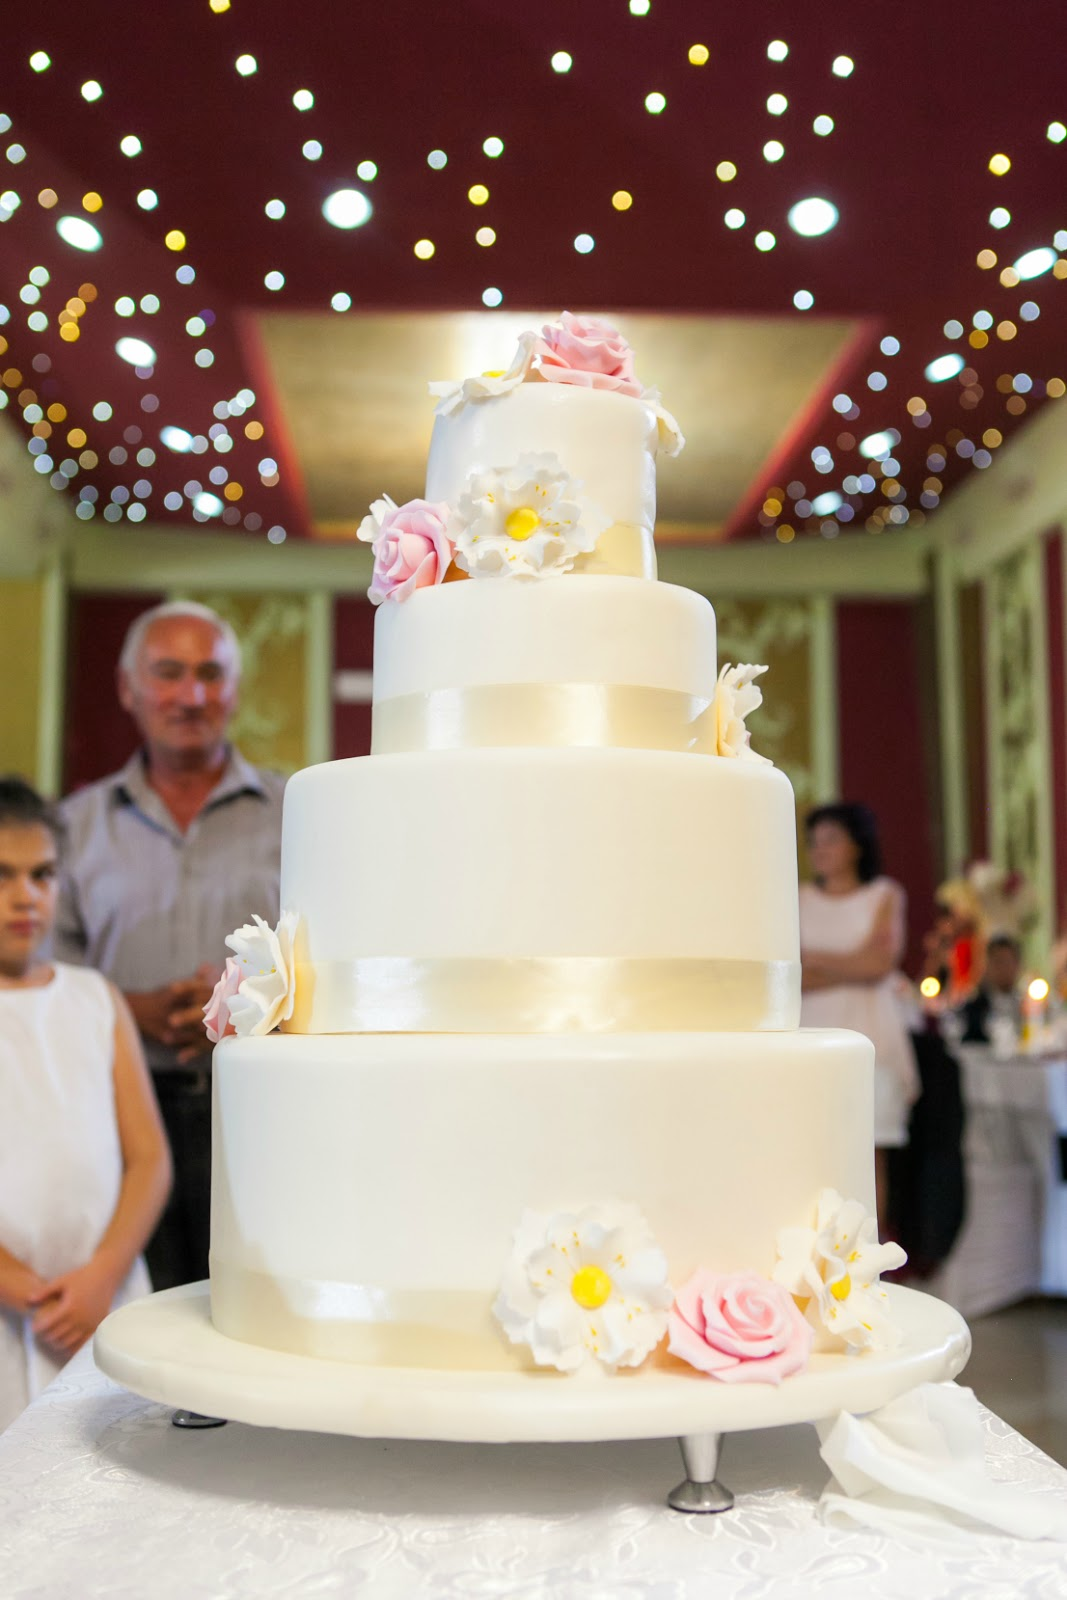 classic wedding cake idea